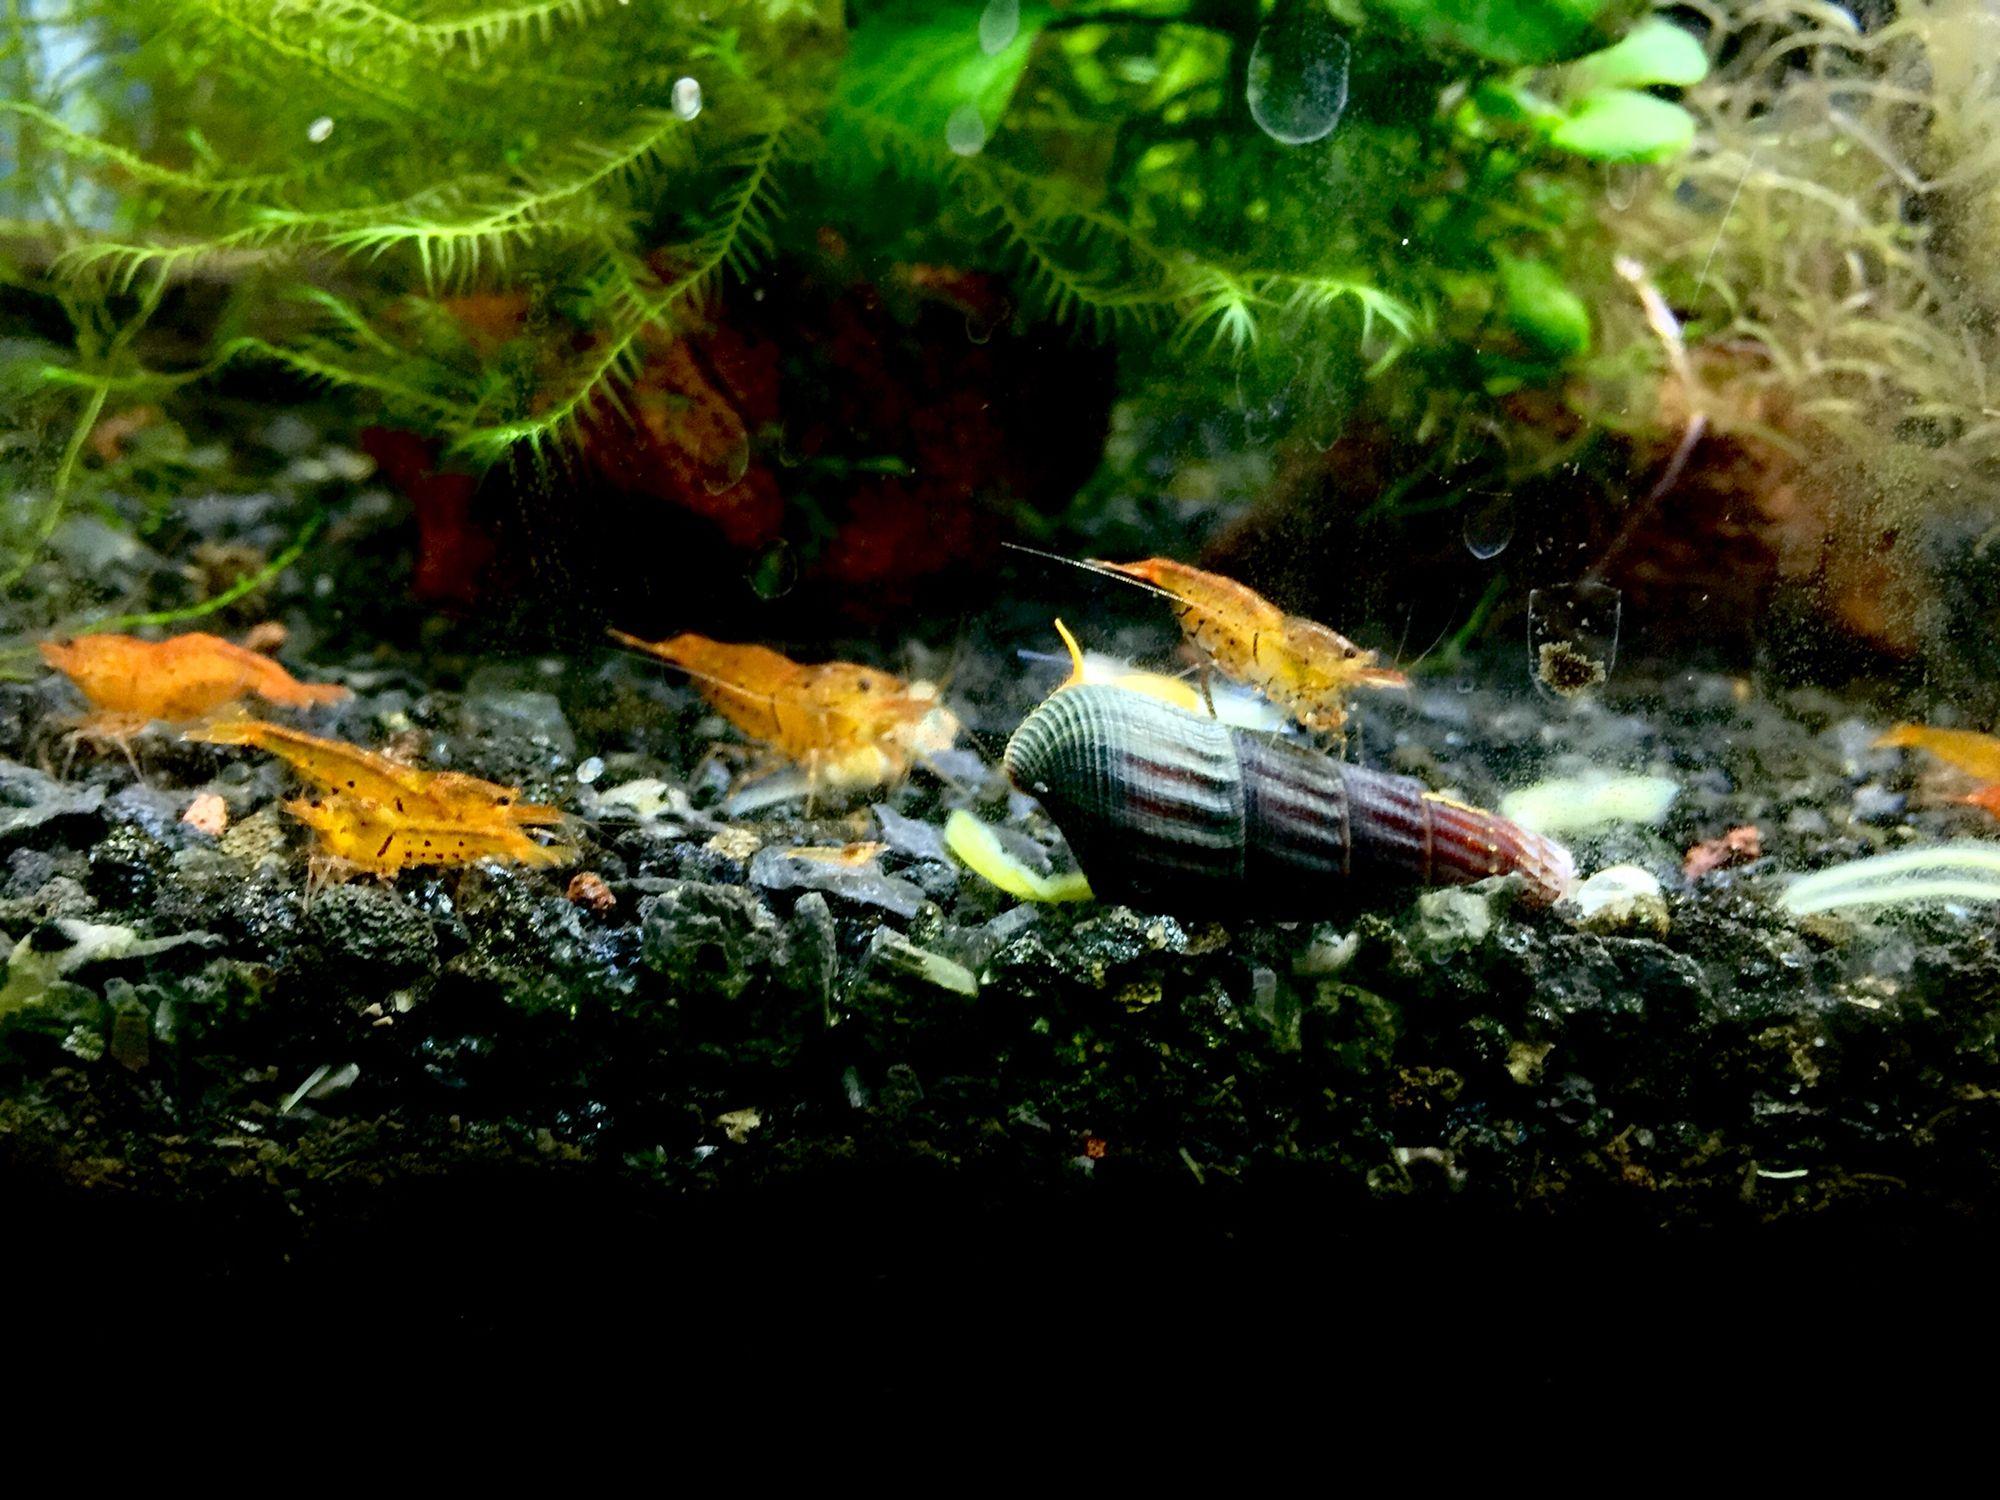 Freshwater aquarium fish that eat snails - Tangerine Tiger Shrimps And Rabbit Snail Are Eating Dry Spinach At Jungle Aqua Shrimp Tiger Shrimpfreshwater Aquariumfish